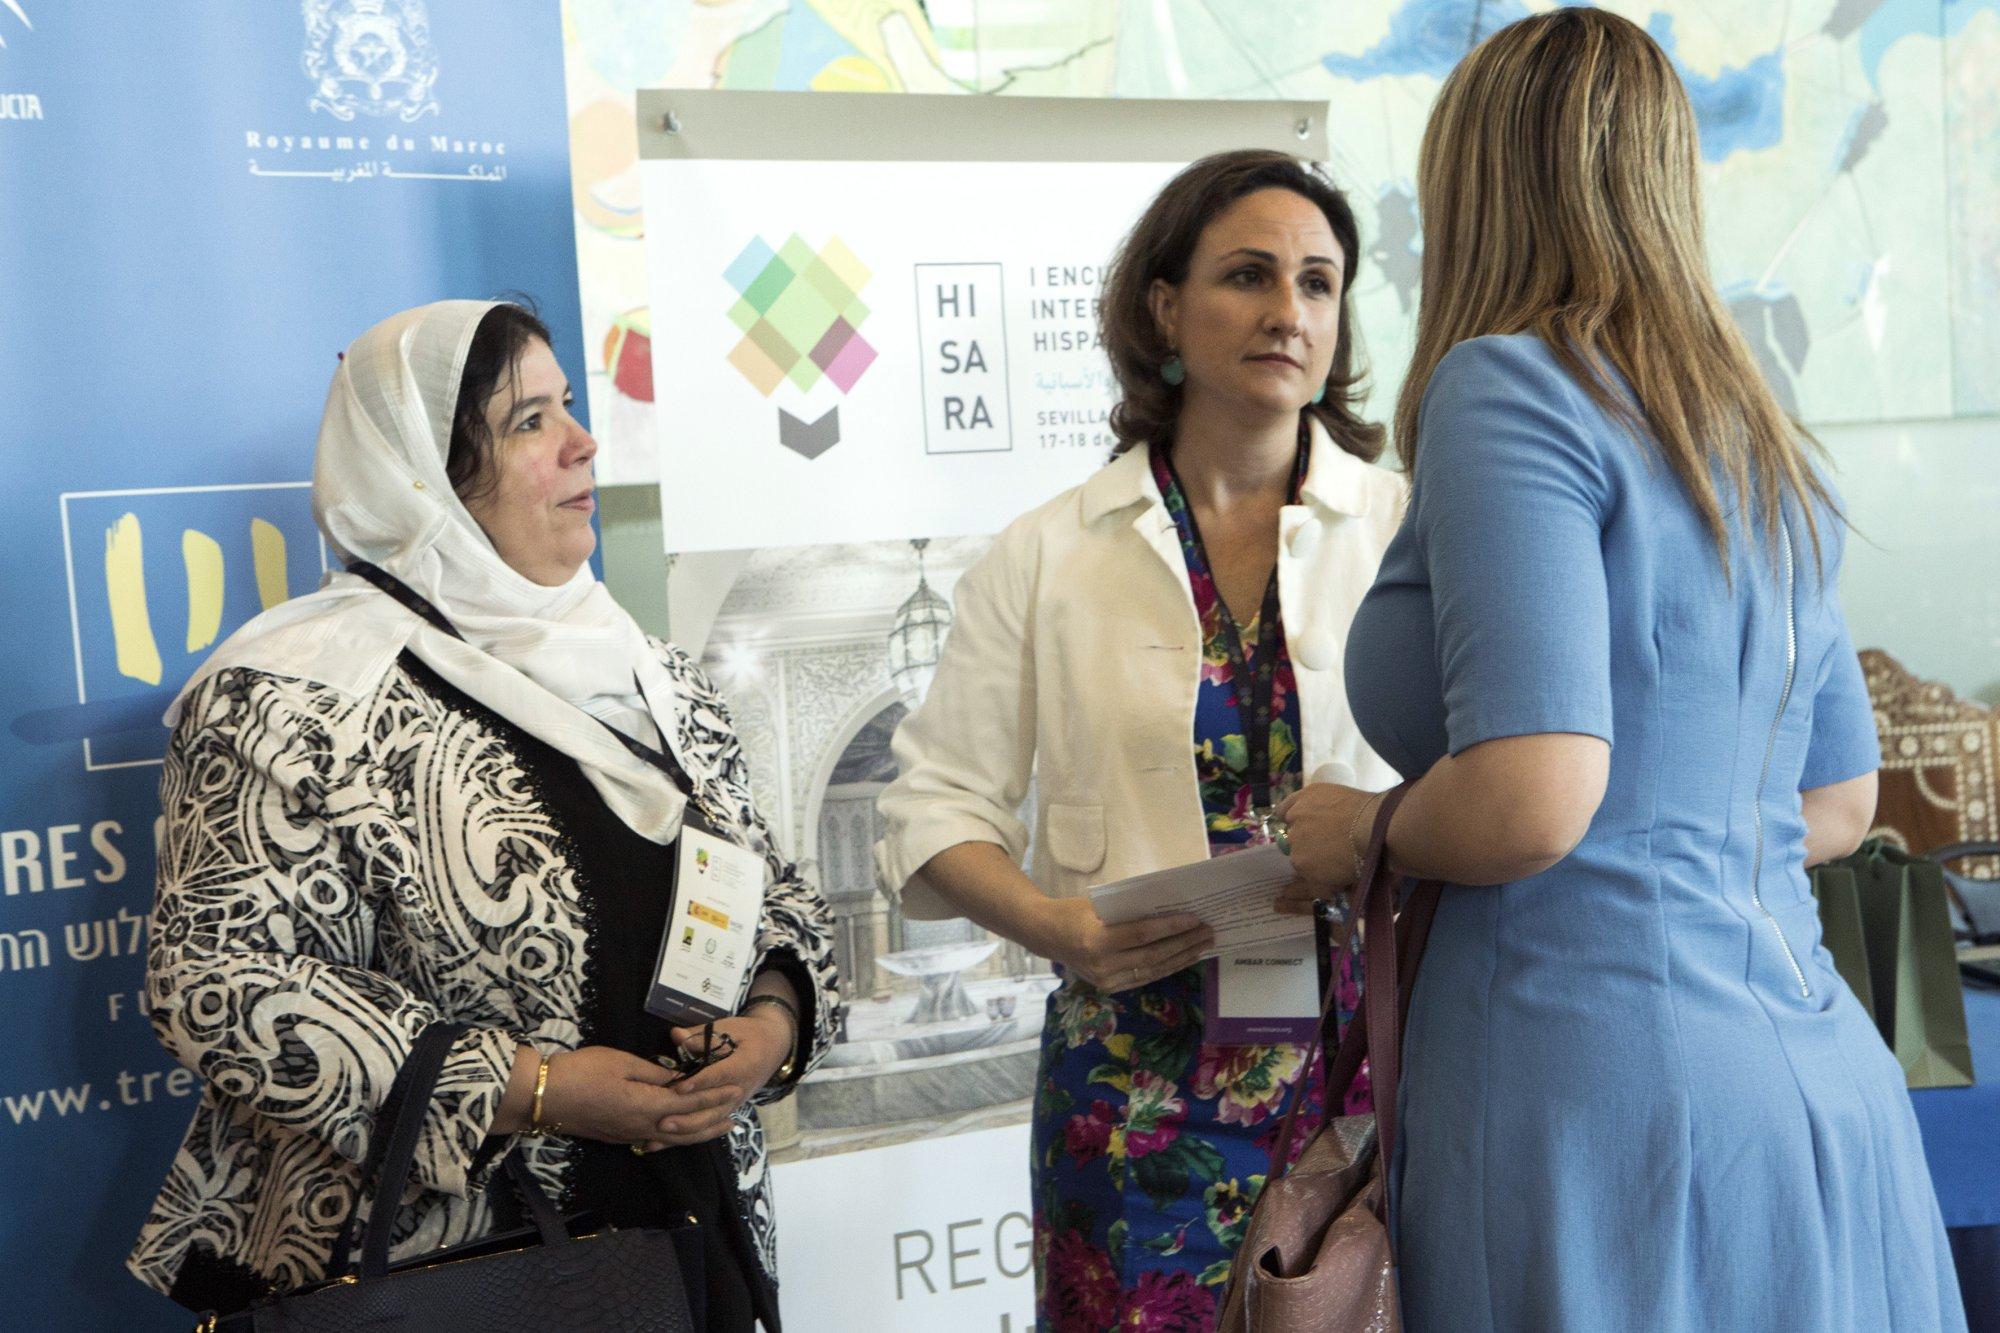 Ms. Derradji Algerian Cultural Attaché and Carolina de Funes